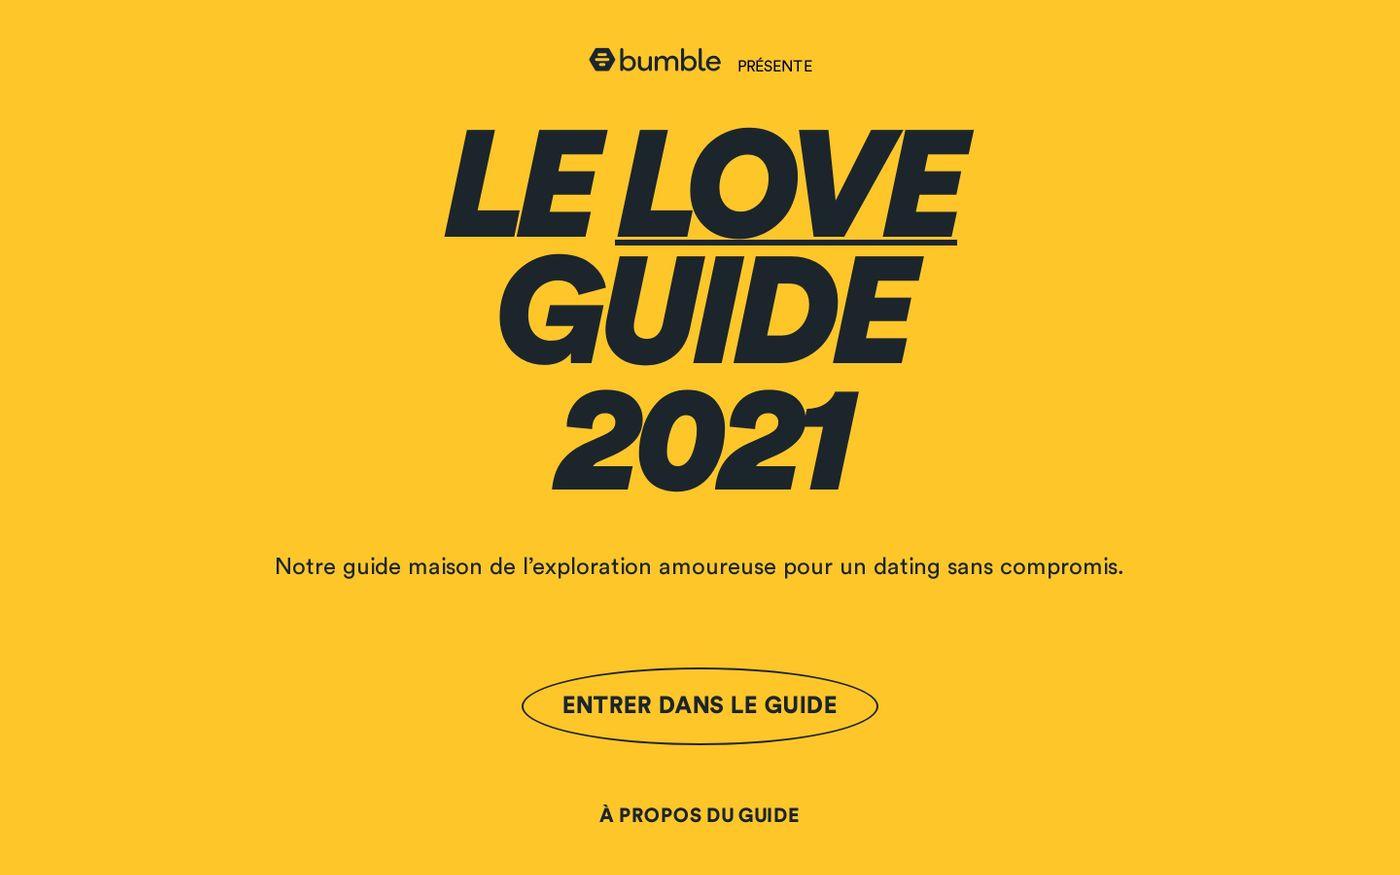 Screenshot of Bumble Love guide 2021 website